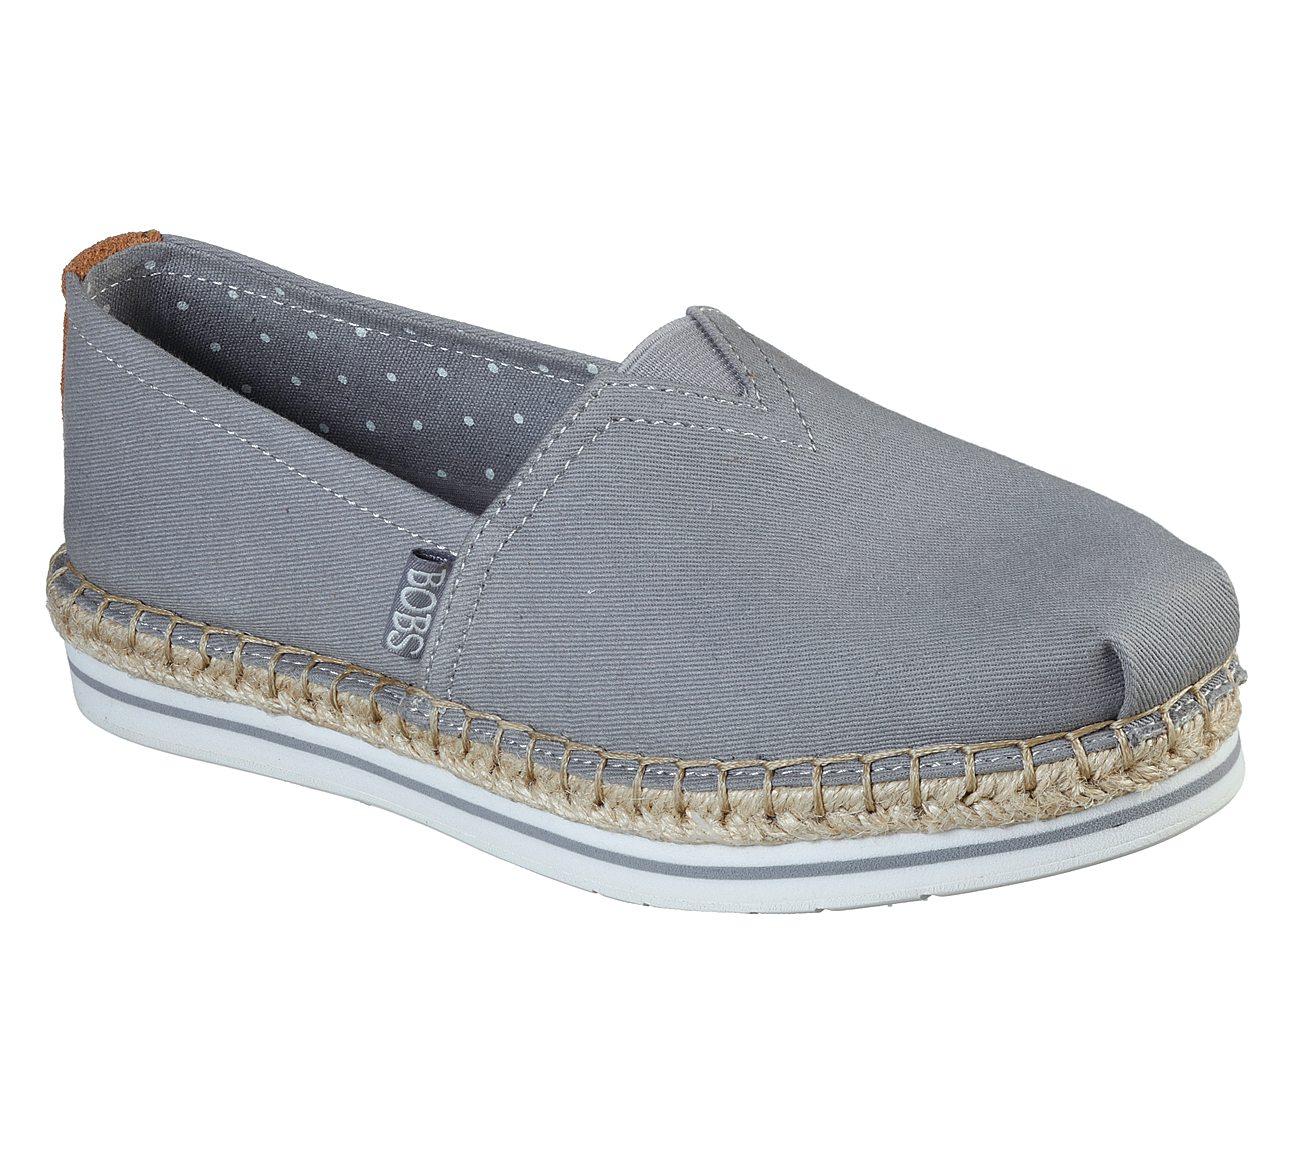 fff63864bee62 Buy SKECHERS BOBS Breeze BOBS Shoes only $58.00